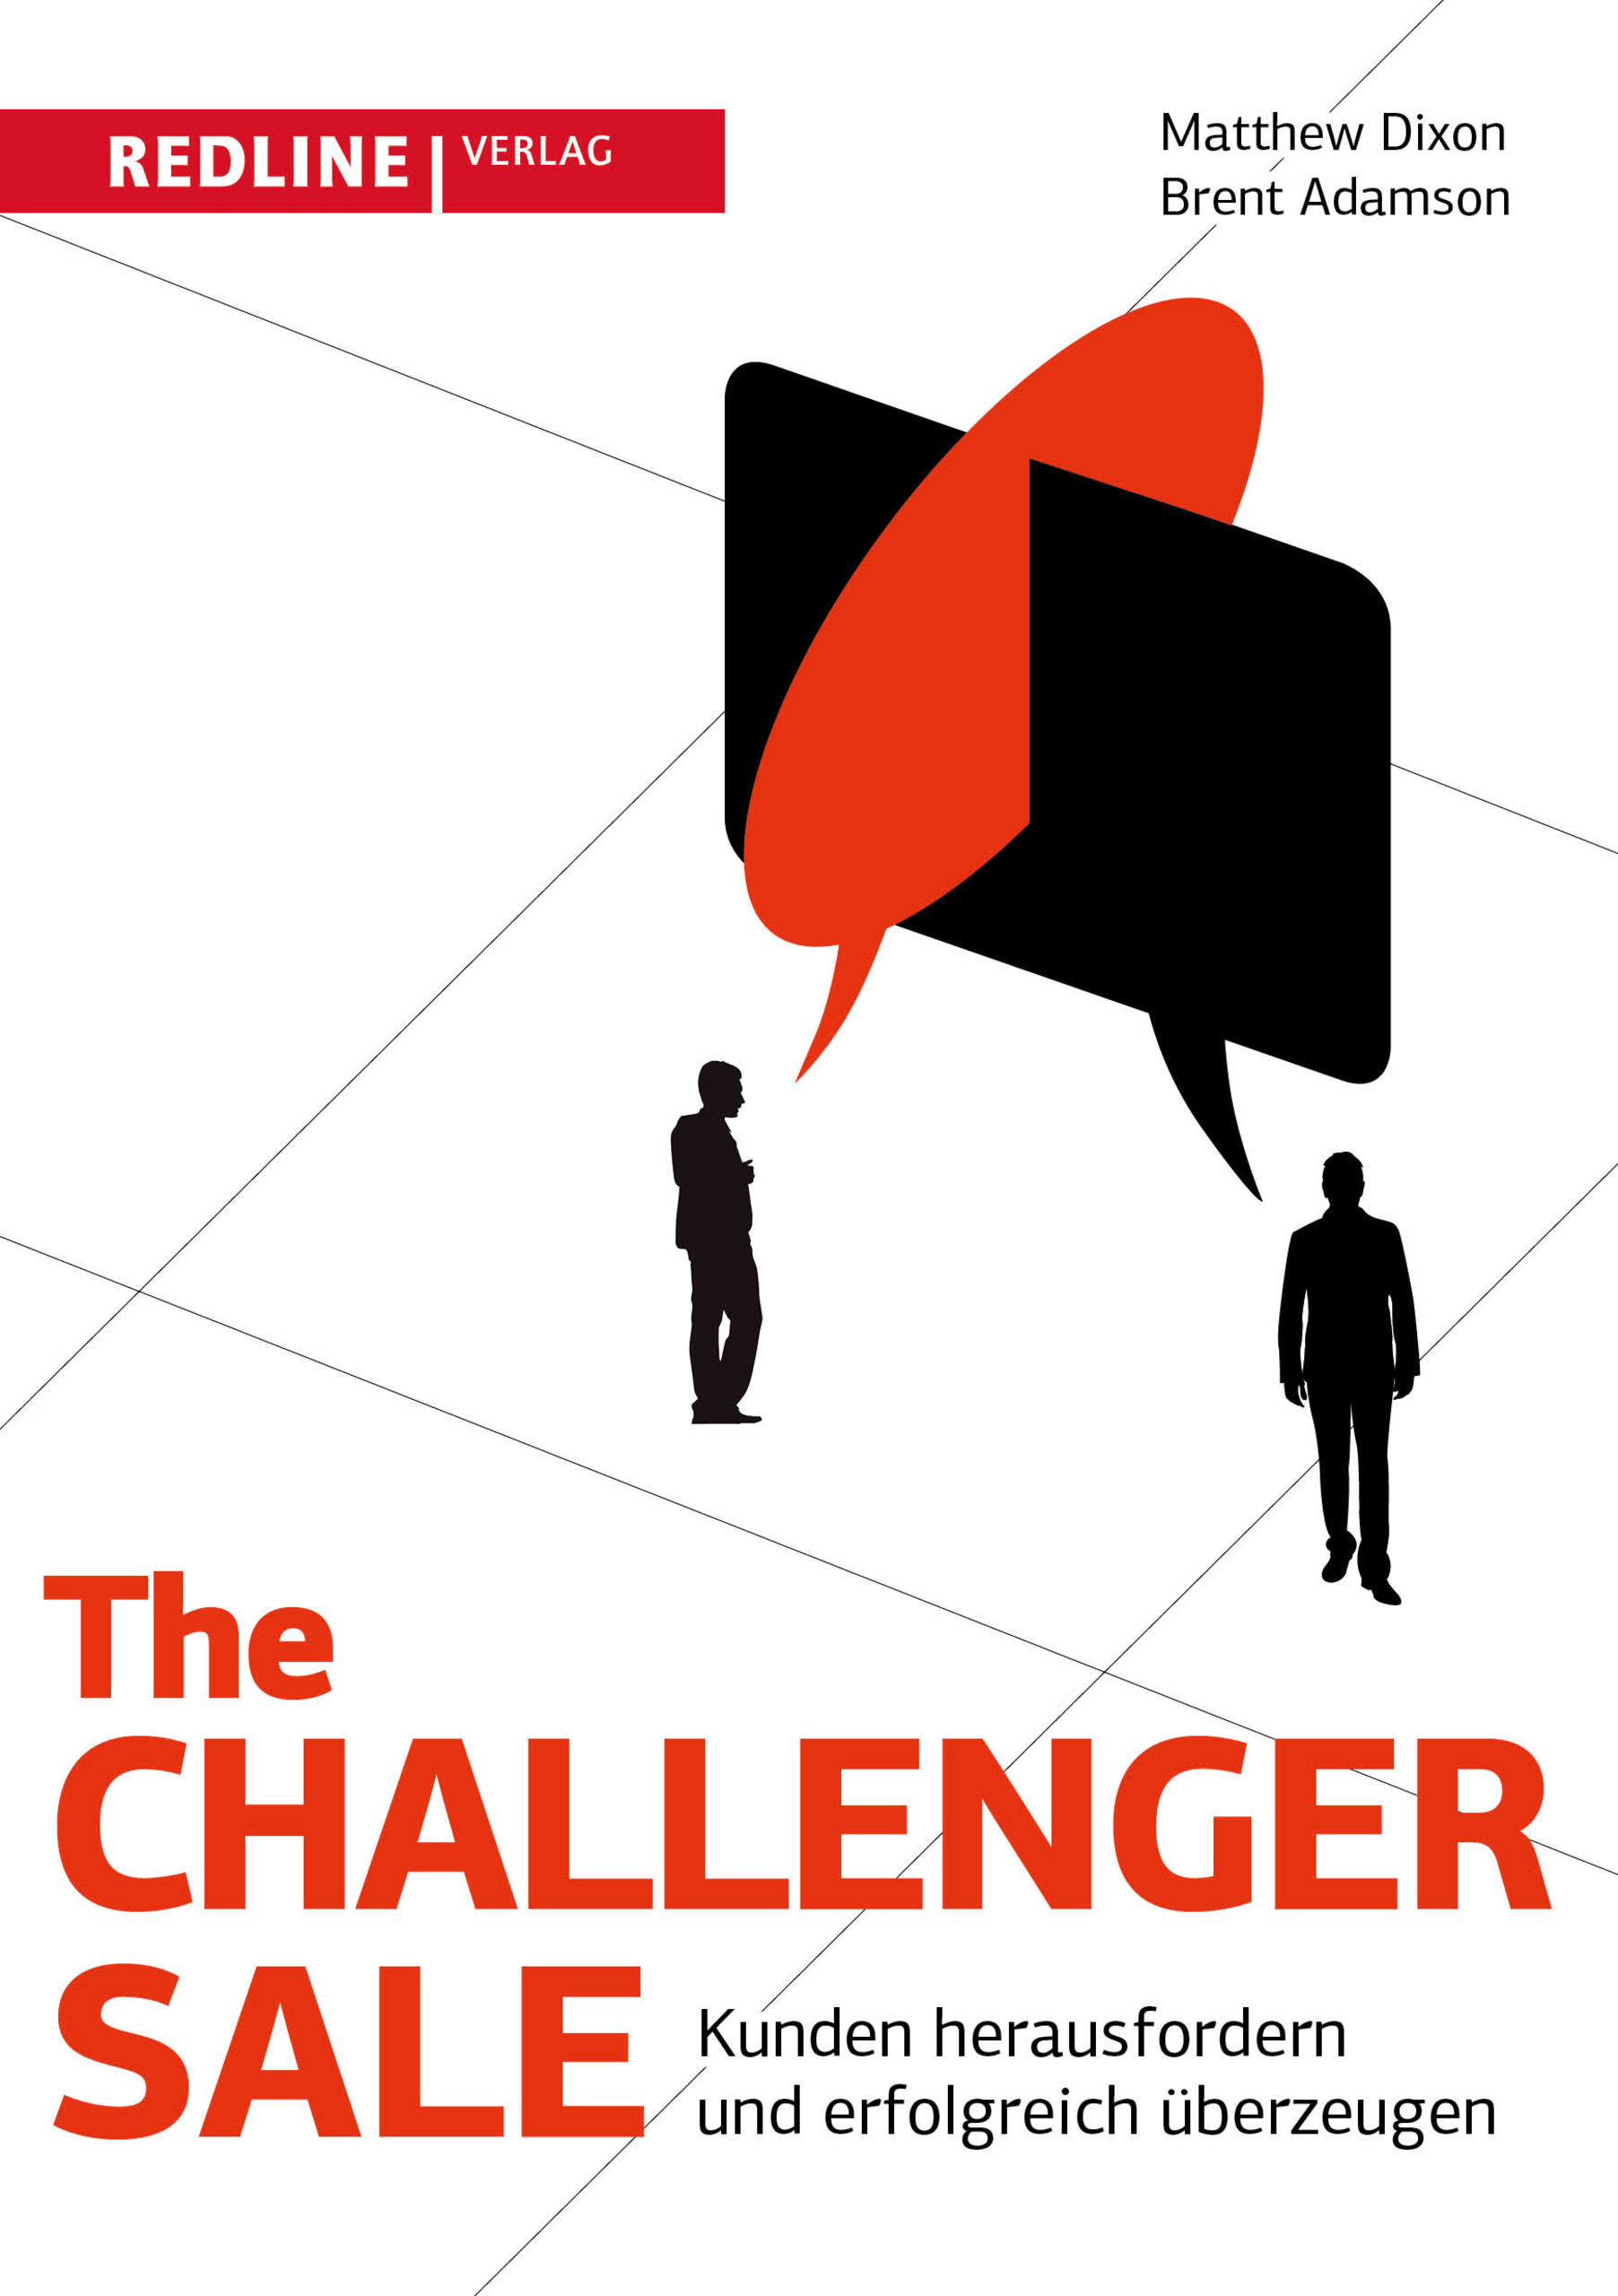 The Challenger Sale Matthew Dixon